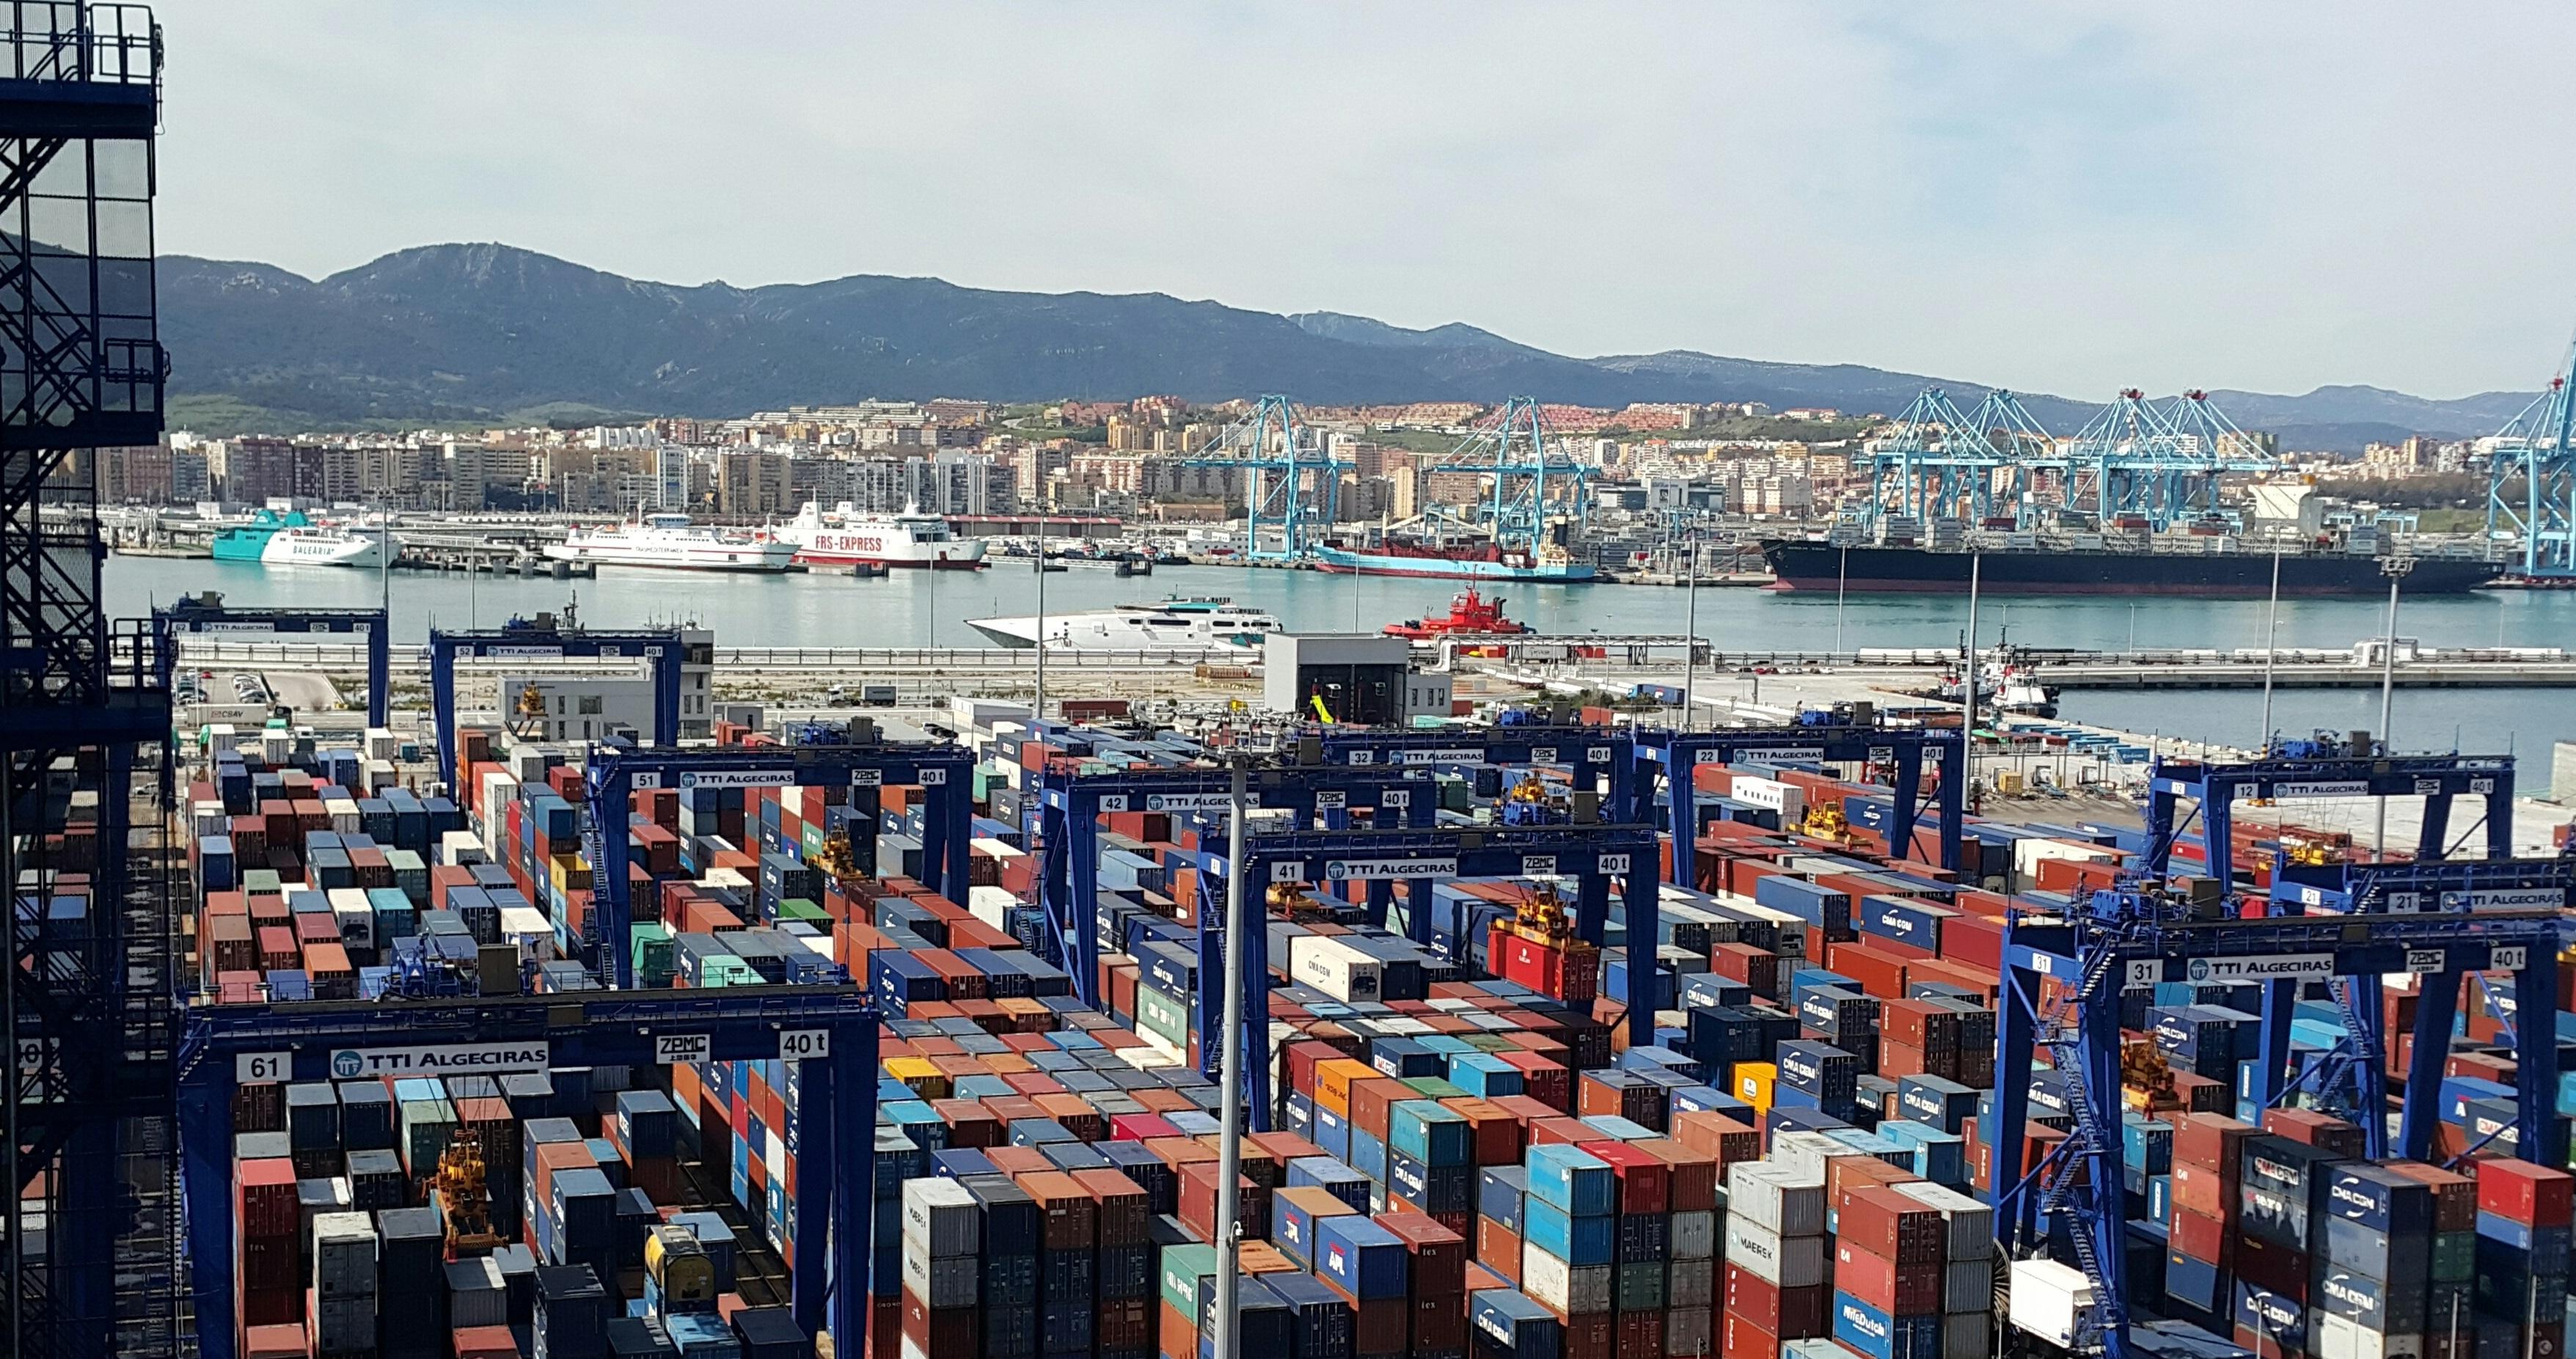 Falleci joaqu n lefler director del puerto de algeciras durante 18 a os al sol de la costa - Puerto de algeciras hoy ...